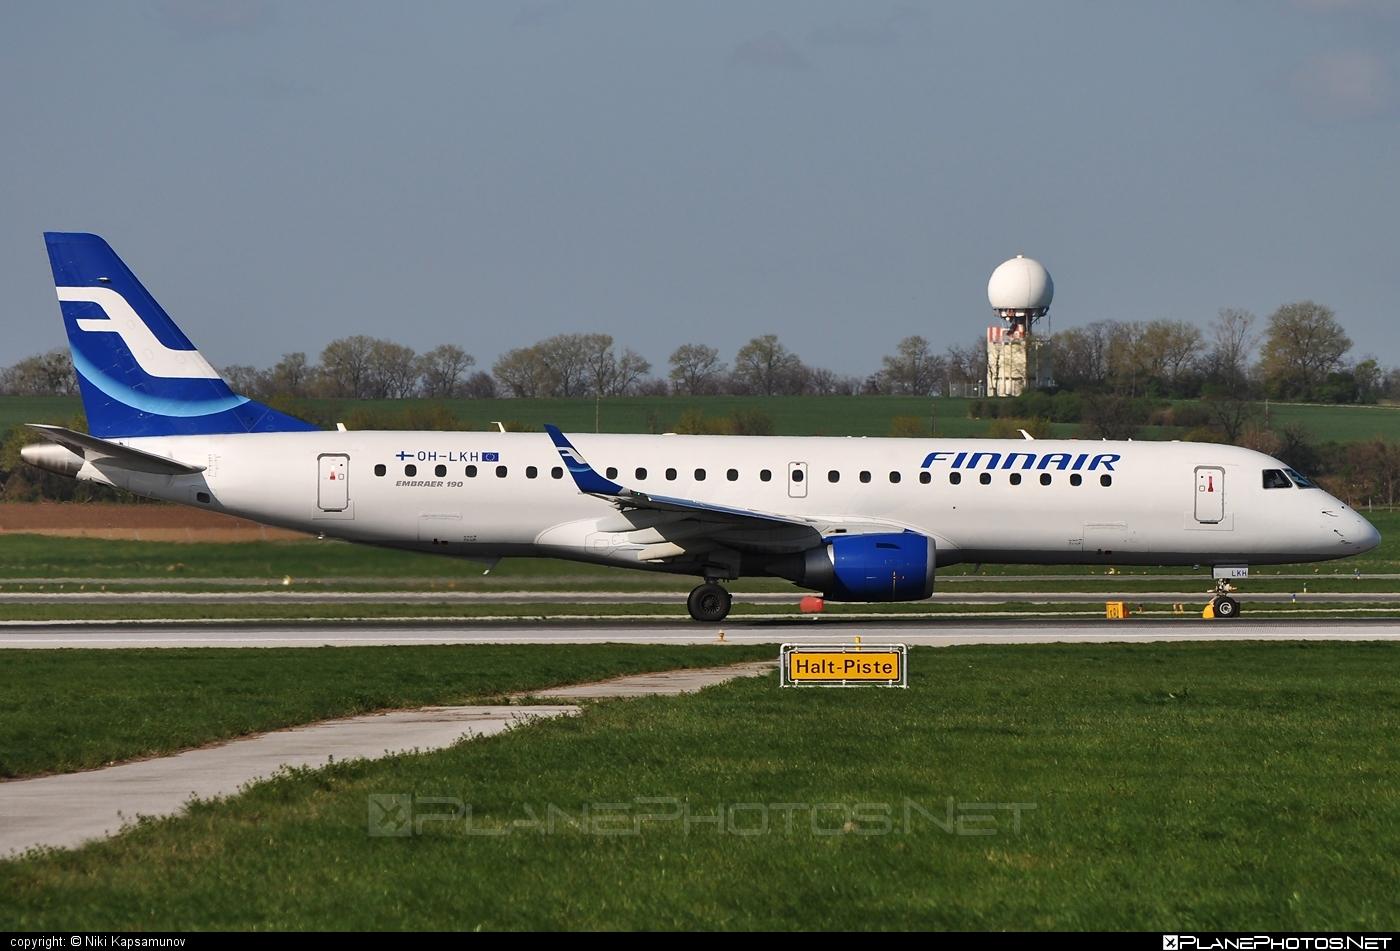 Embraer E190LR (ERJ-190-100LR) - OH-LKH operated by Finnair #e190 #e190100 #e190100lr #e190lr #embraer #embraer190 #embraer190100lr #embraer190lr #finnair